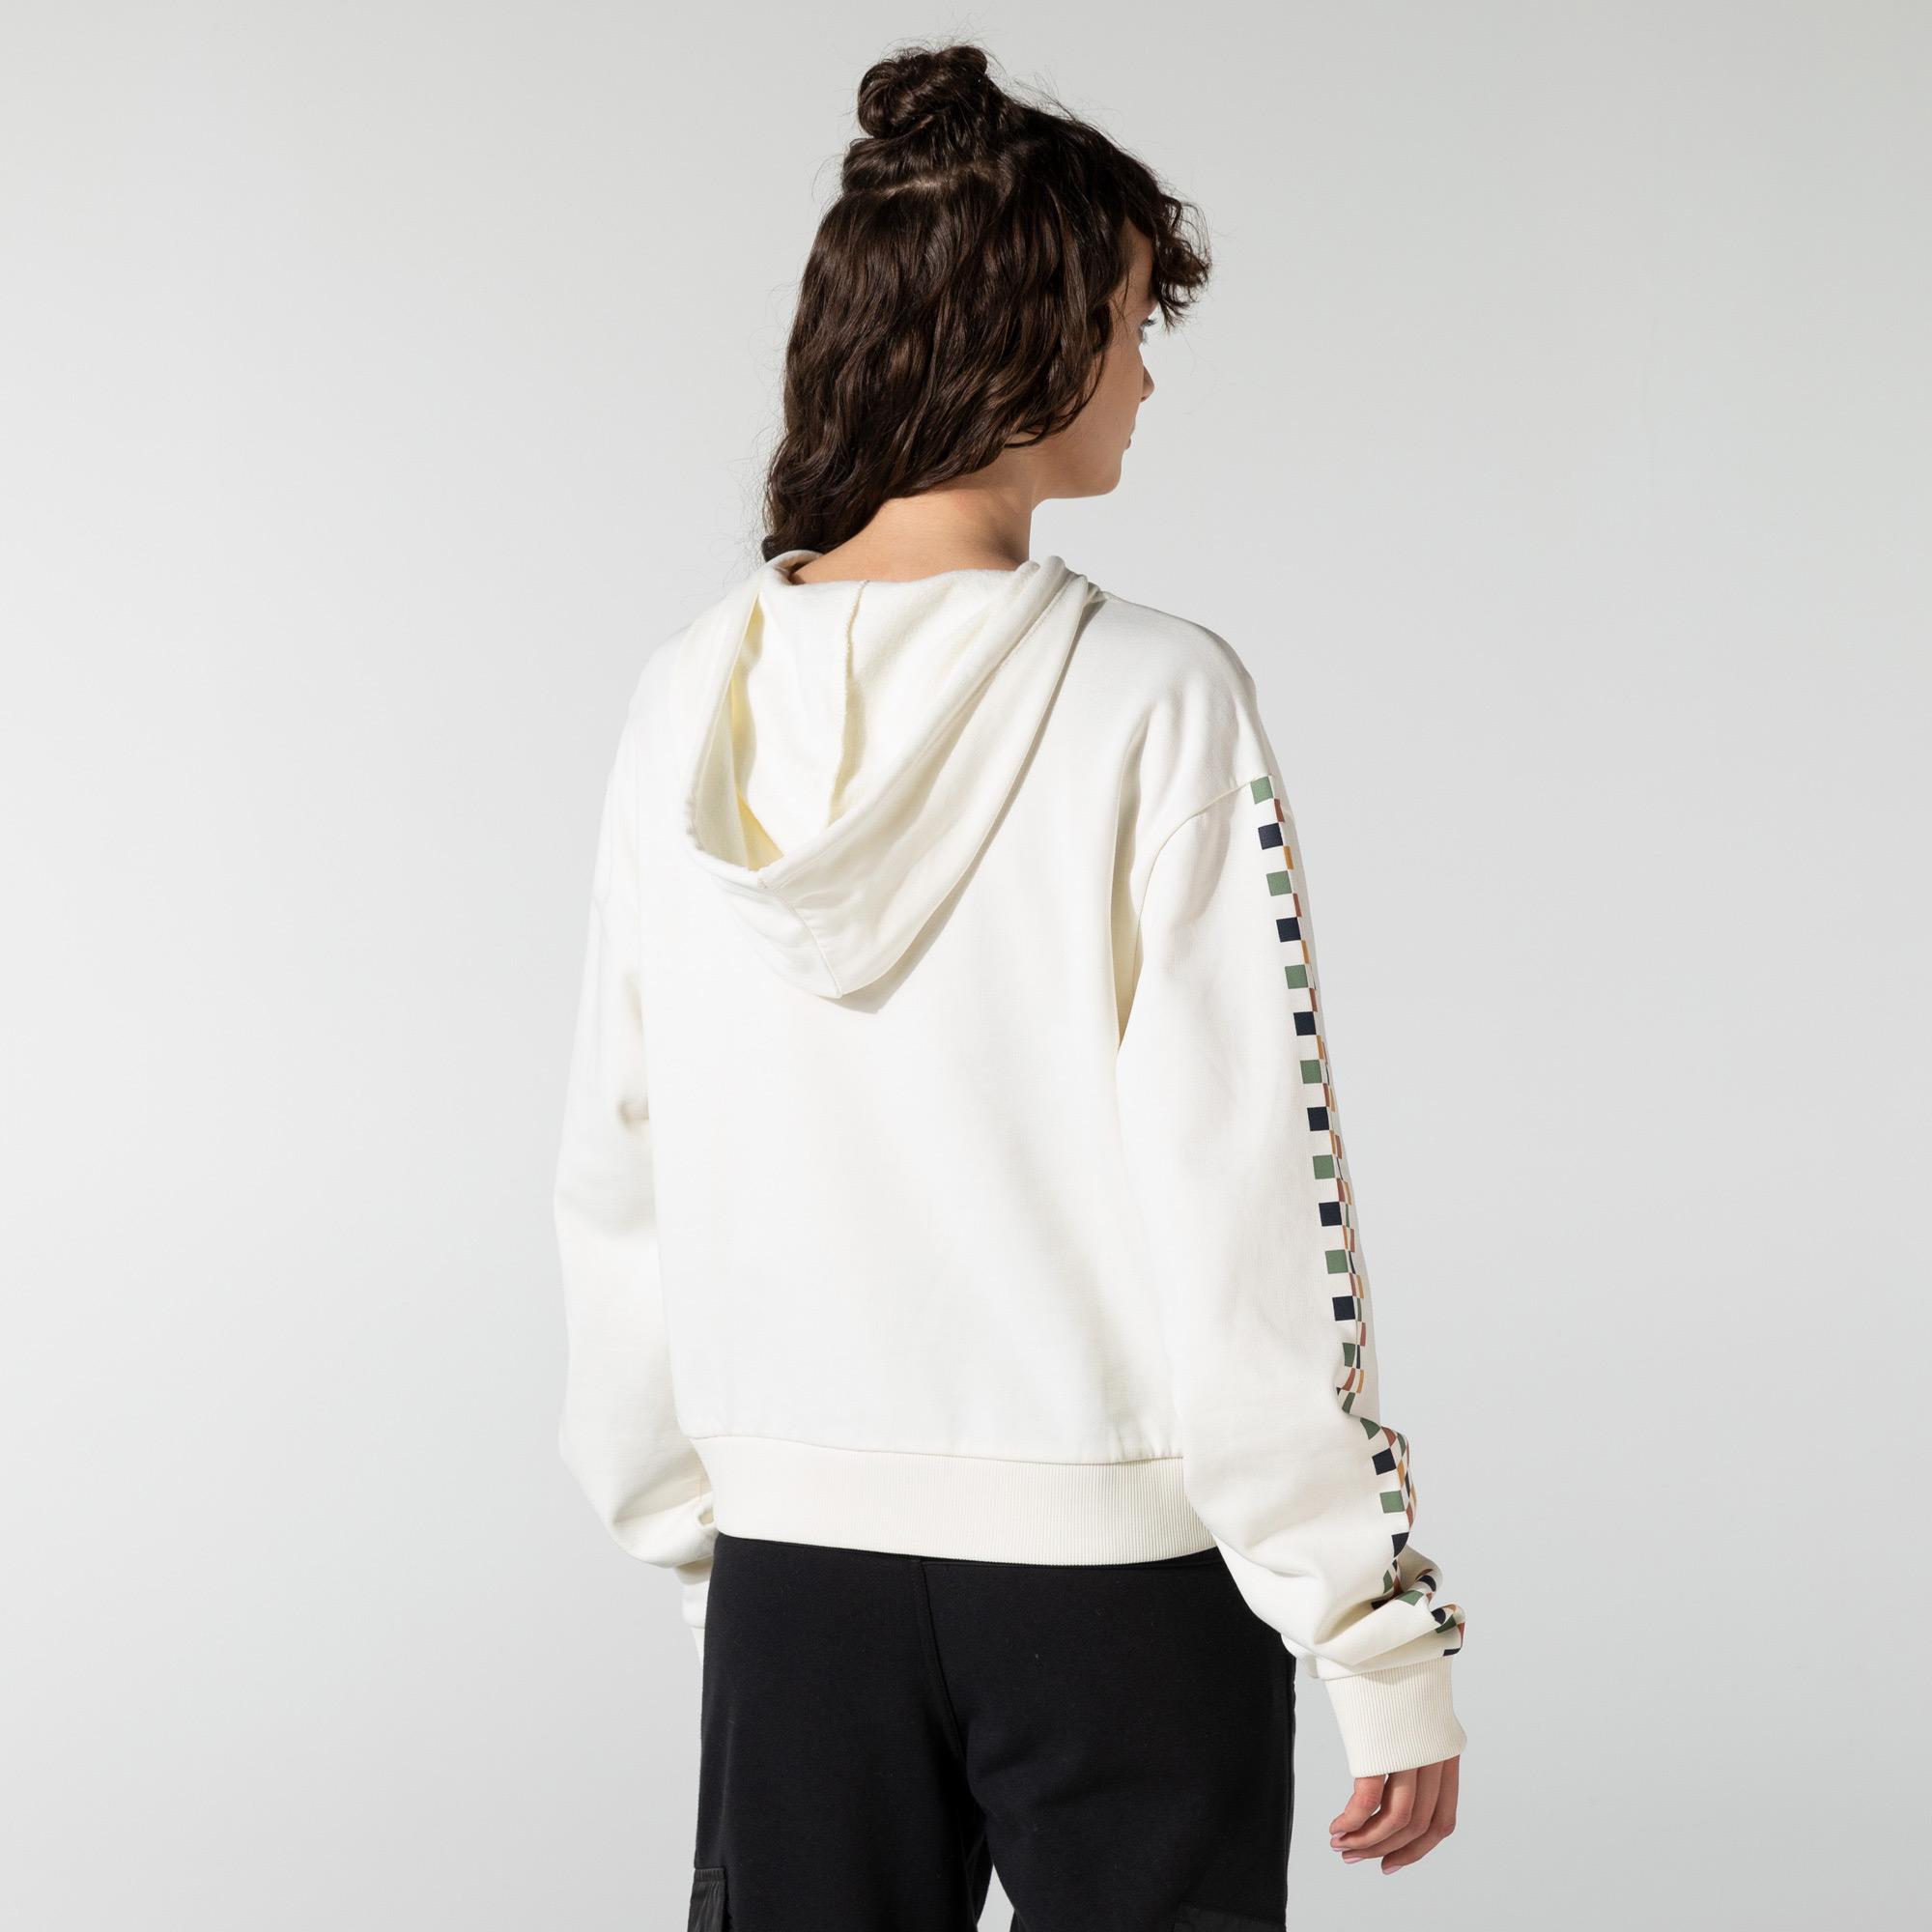 Vans Karina Rozunko Kadın Beyaz Sweatshirt